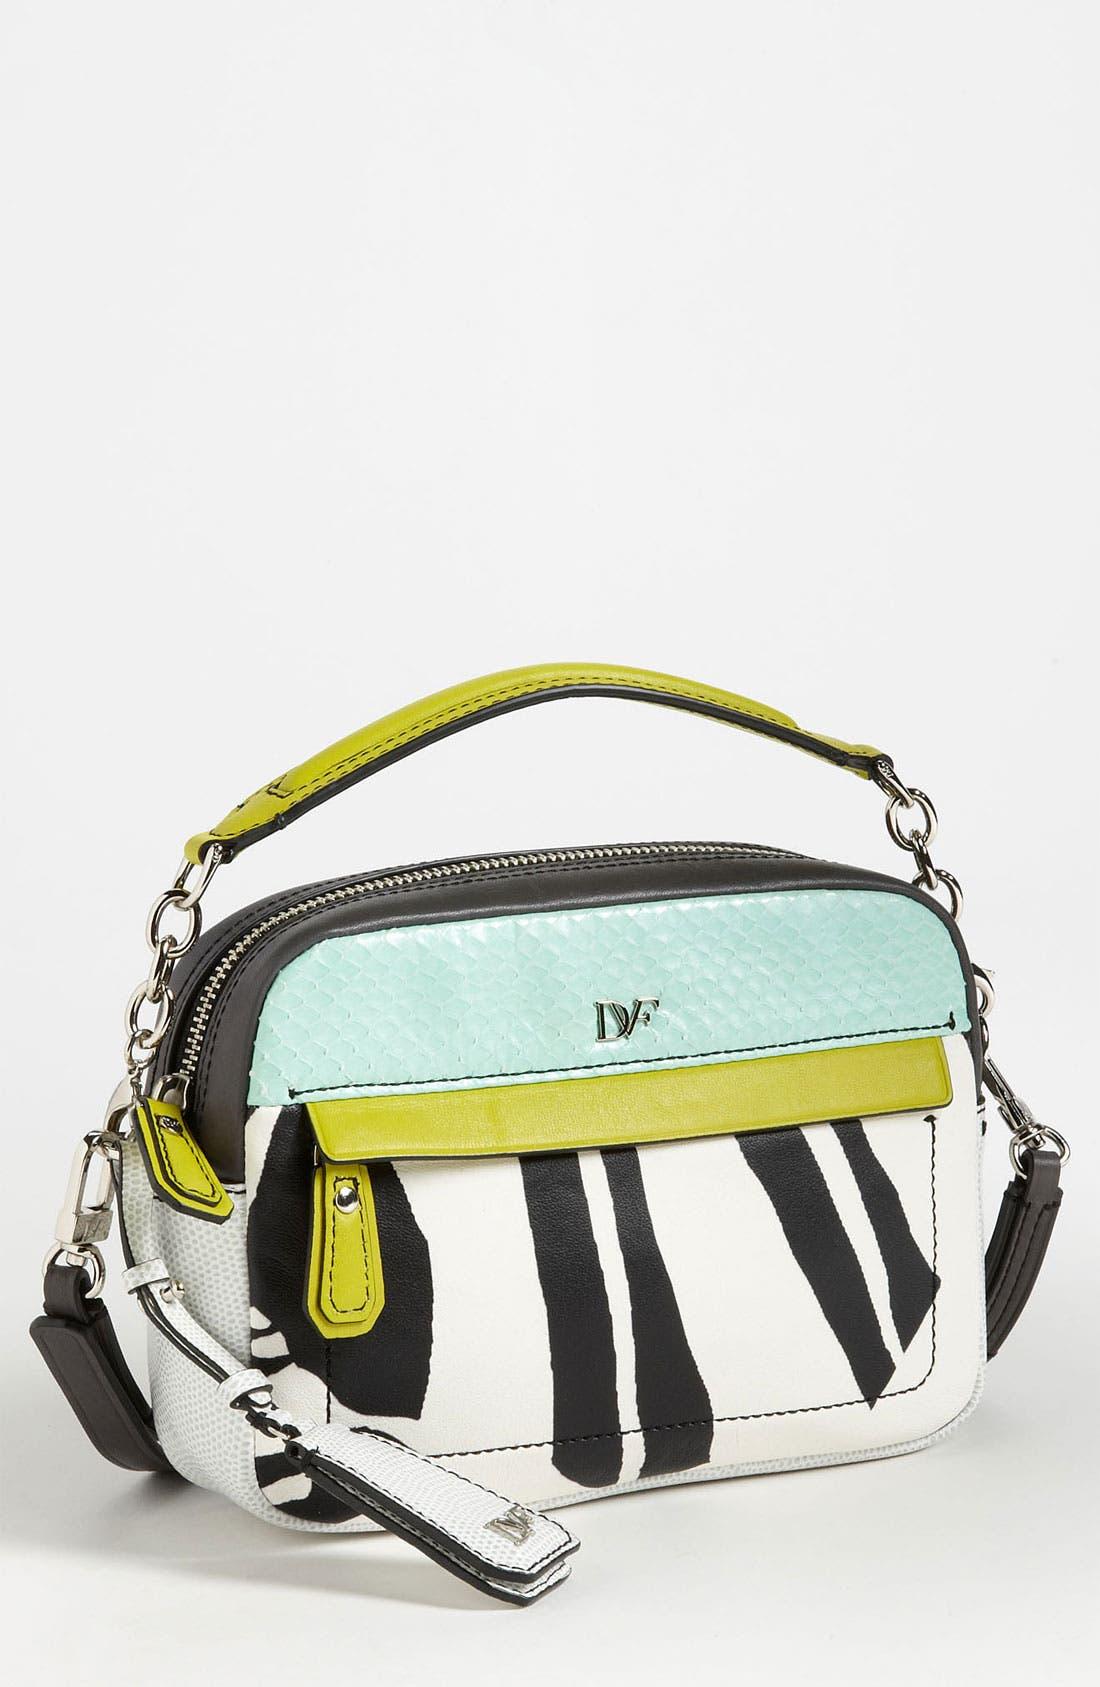 Main Image - Diane von Furstenberg 'Milo - Mini' Printed Leather Crossbody Bag